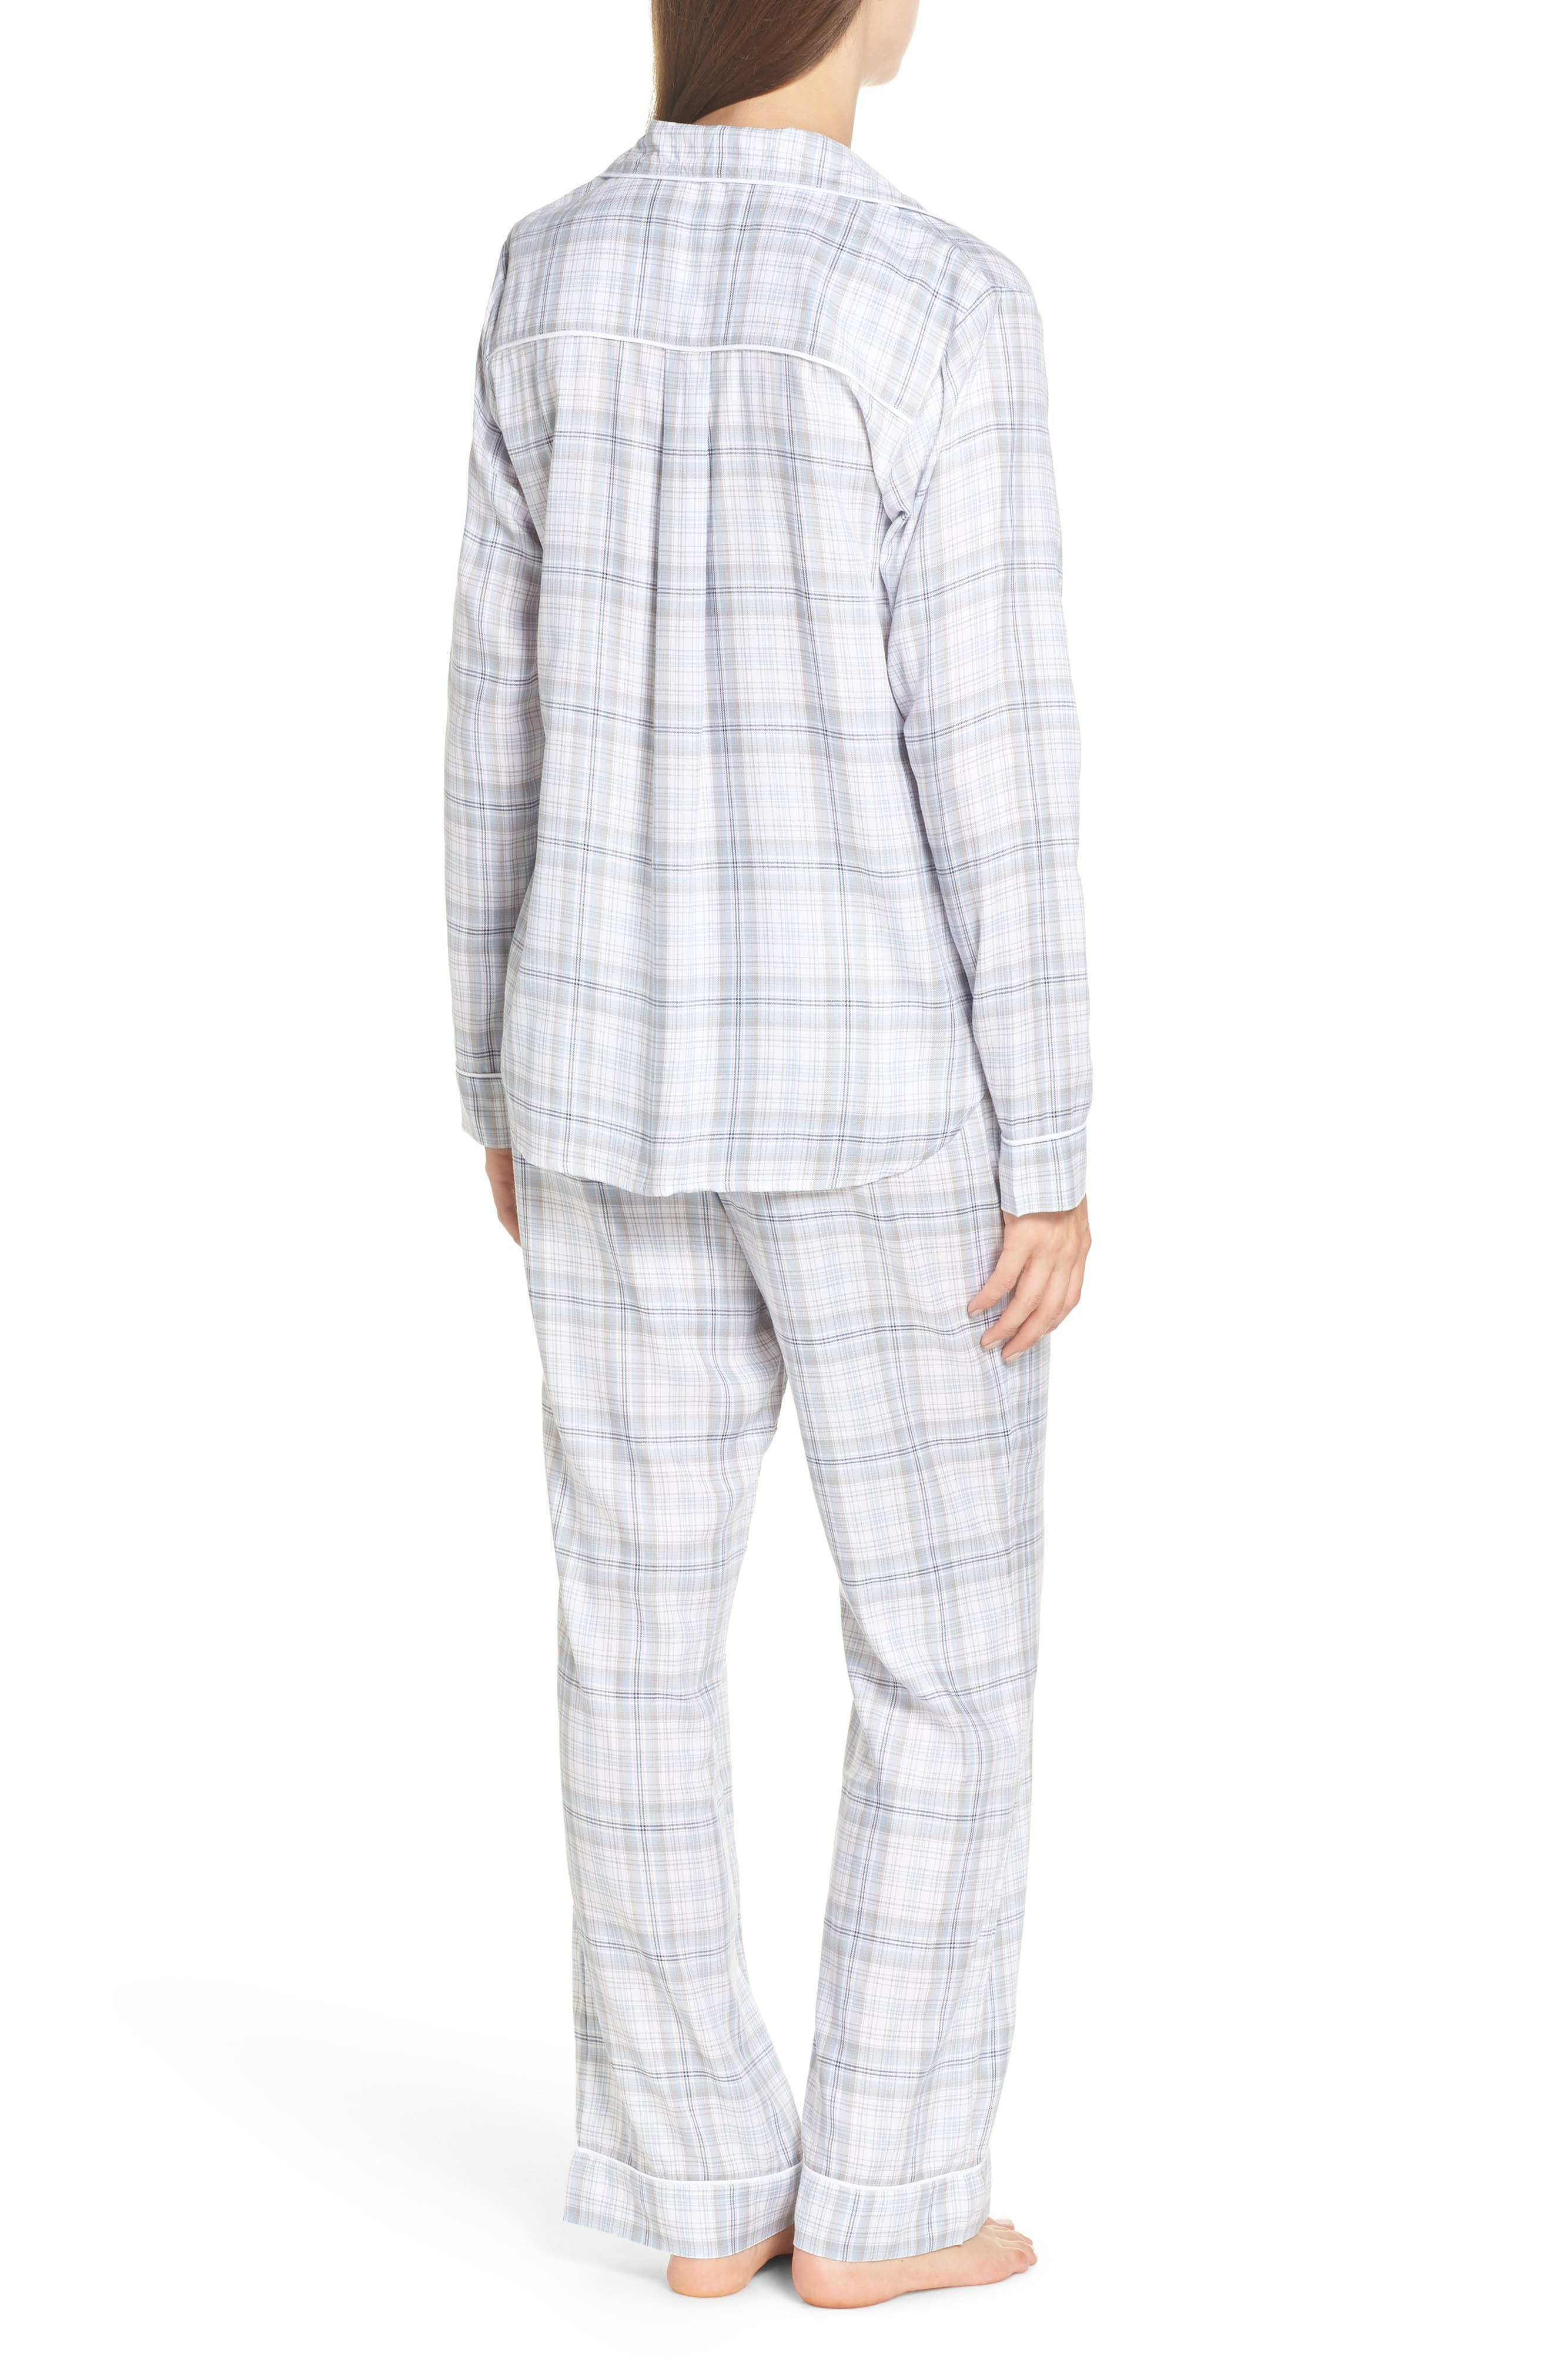 Raven Plaid Pajamas,                             Alternate thumbnail 2, color,                             453